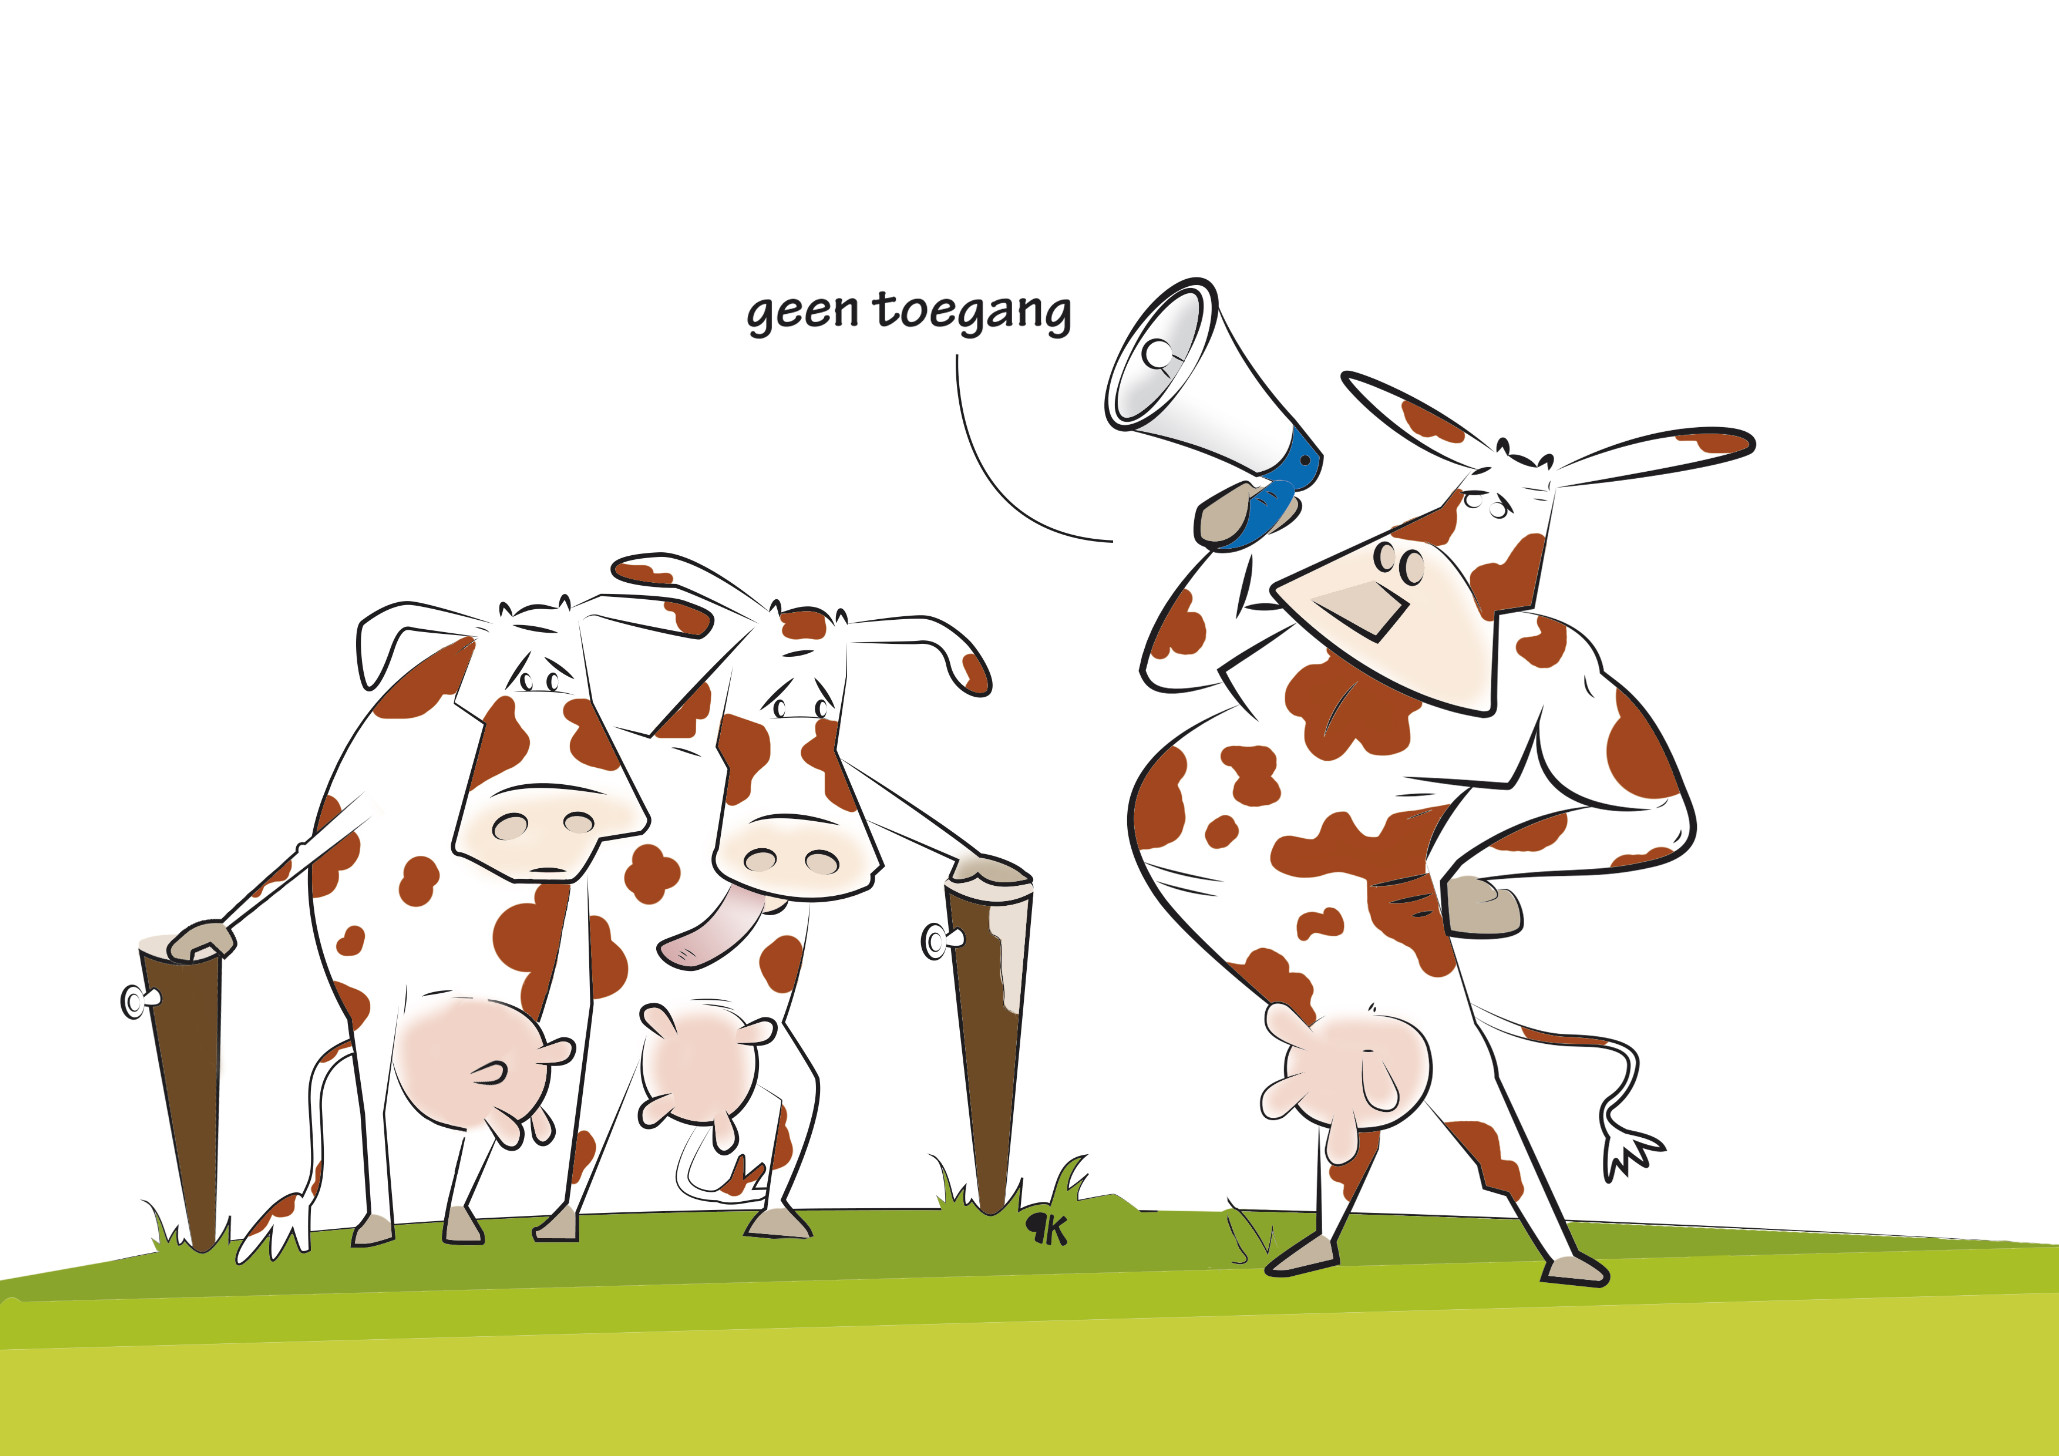 Alle seinen op groen om gras op gang te helpen